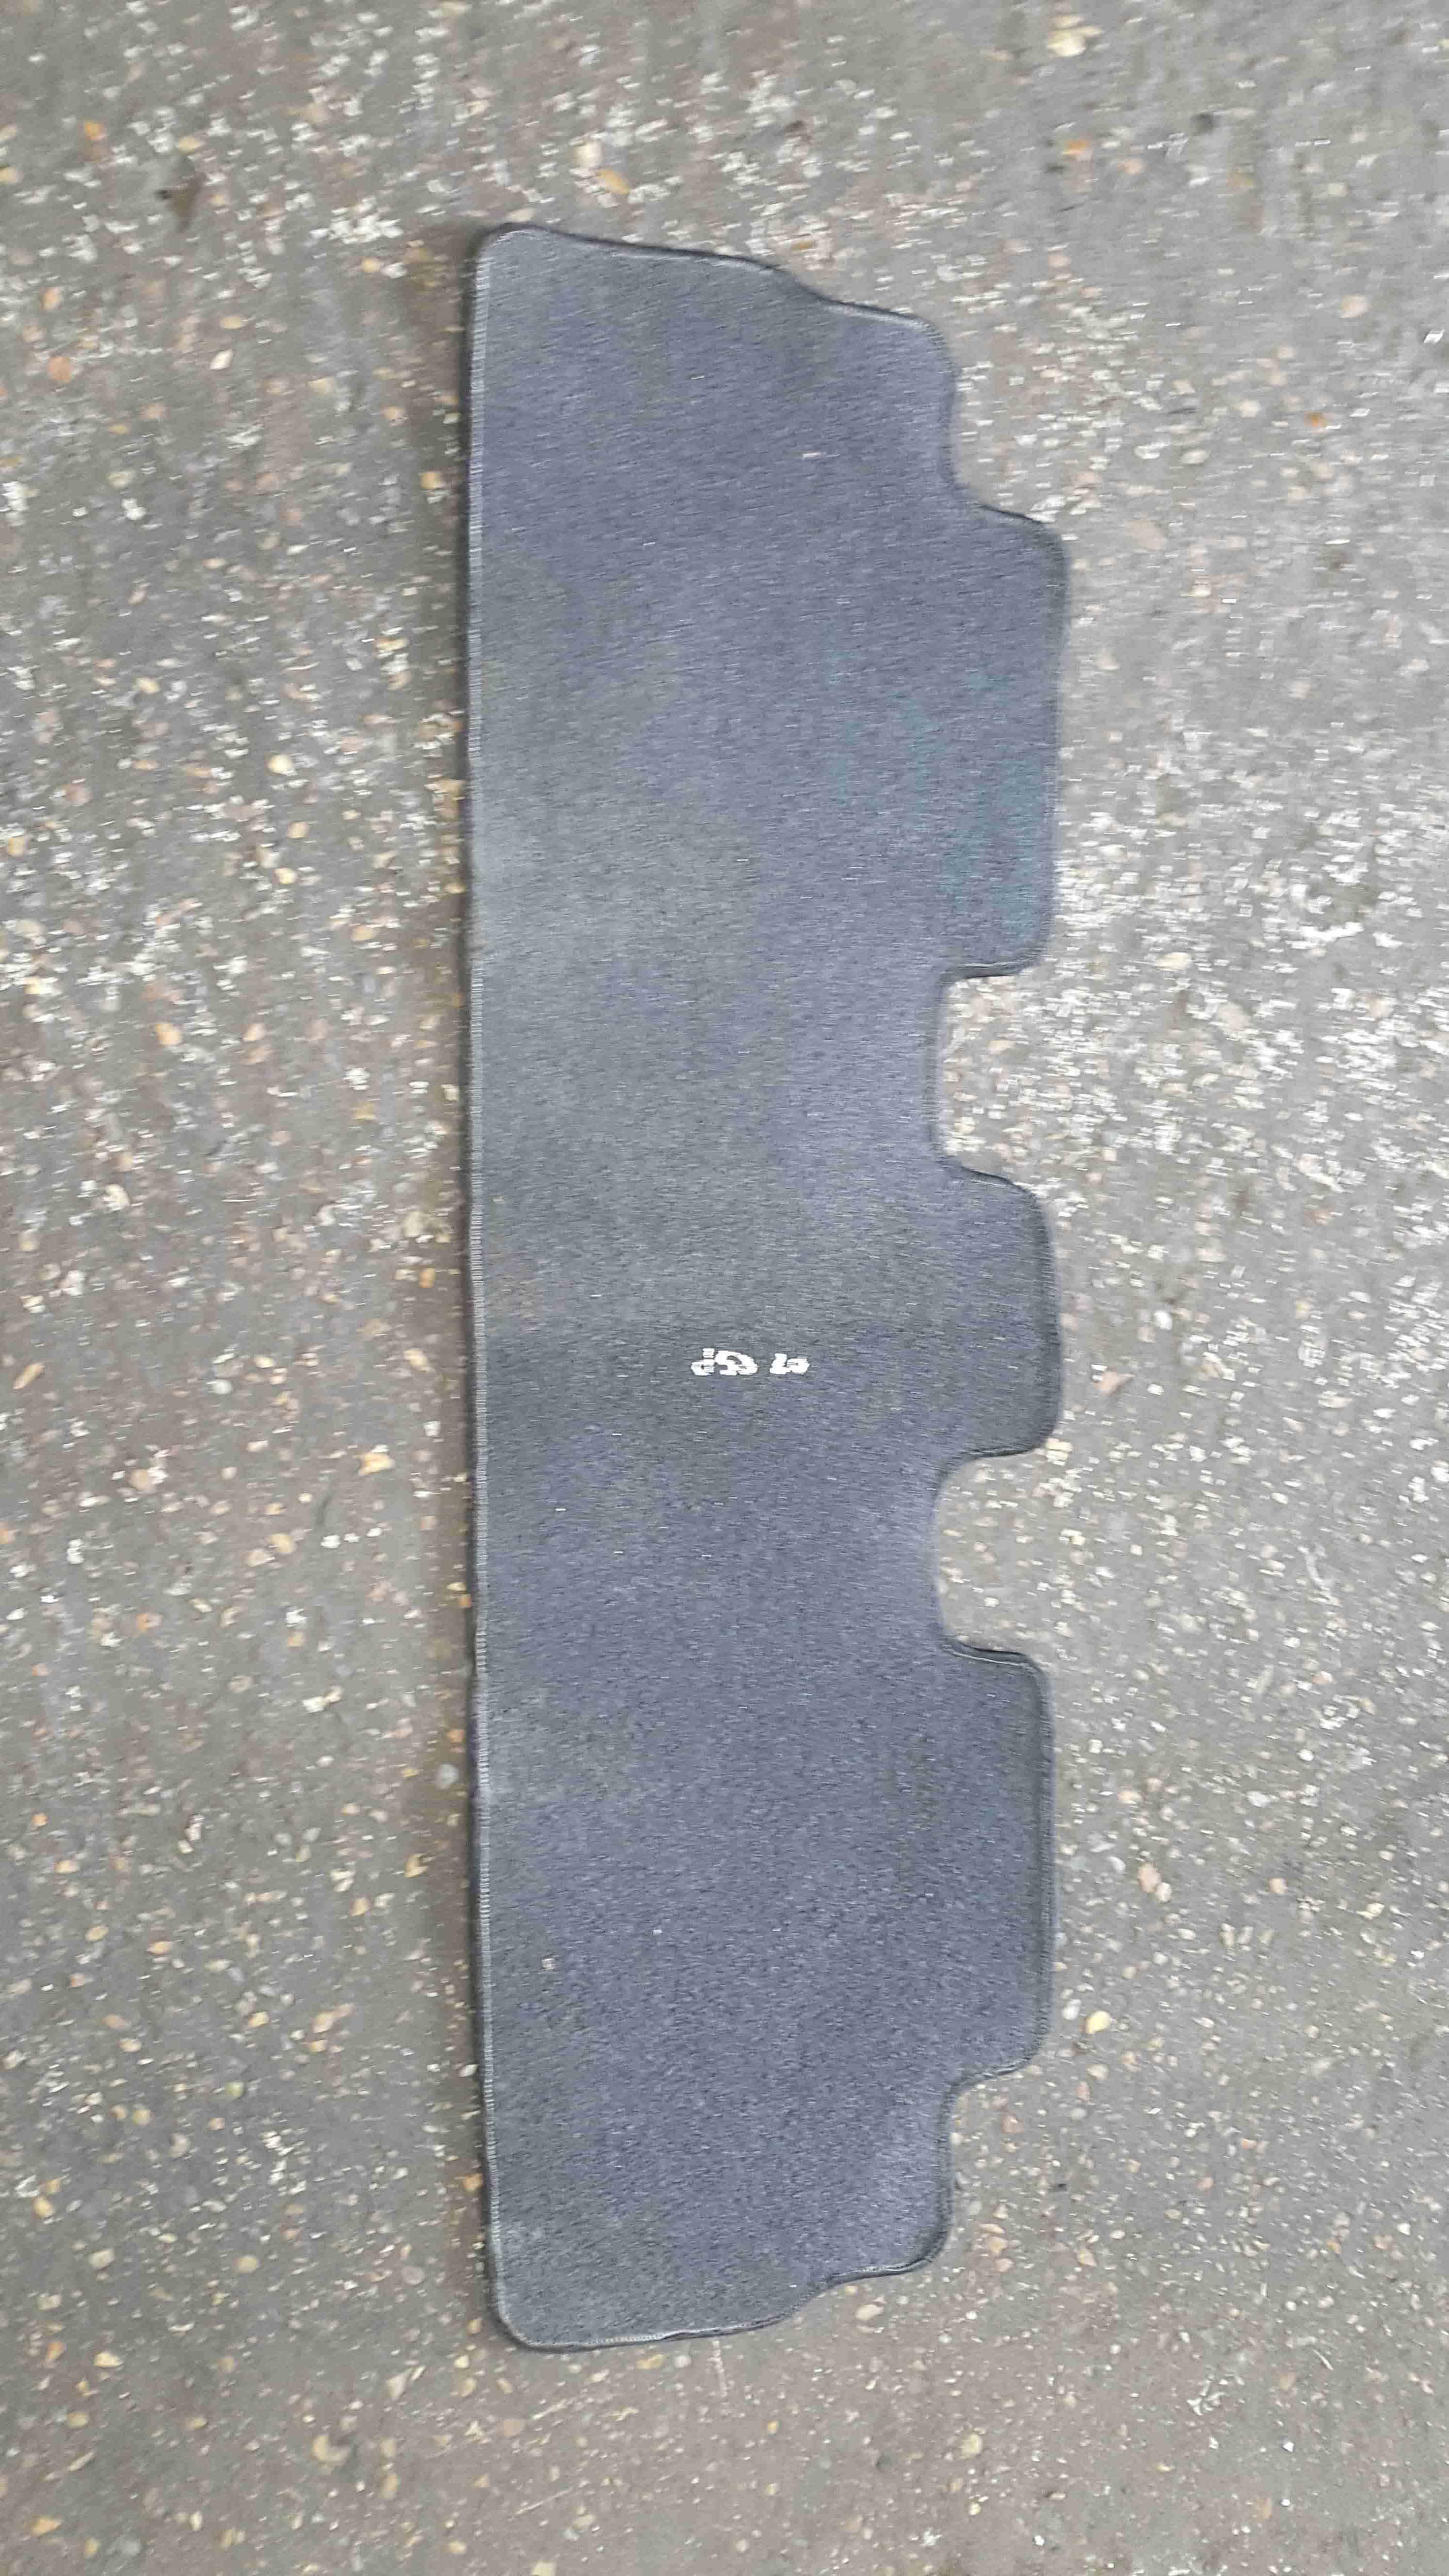 Renault Espace 2003-2013 Rear Passenger Floor Carpet